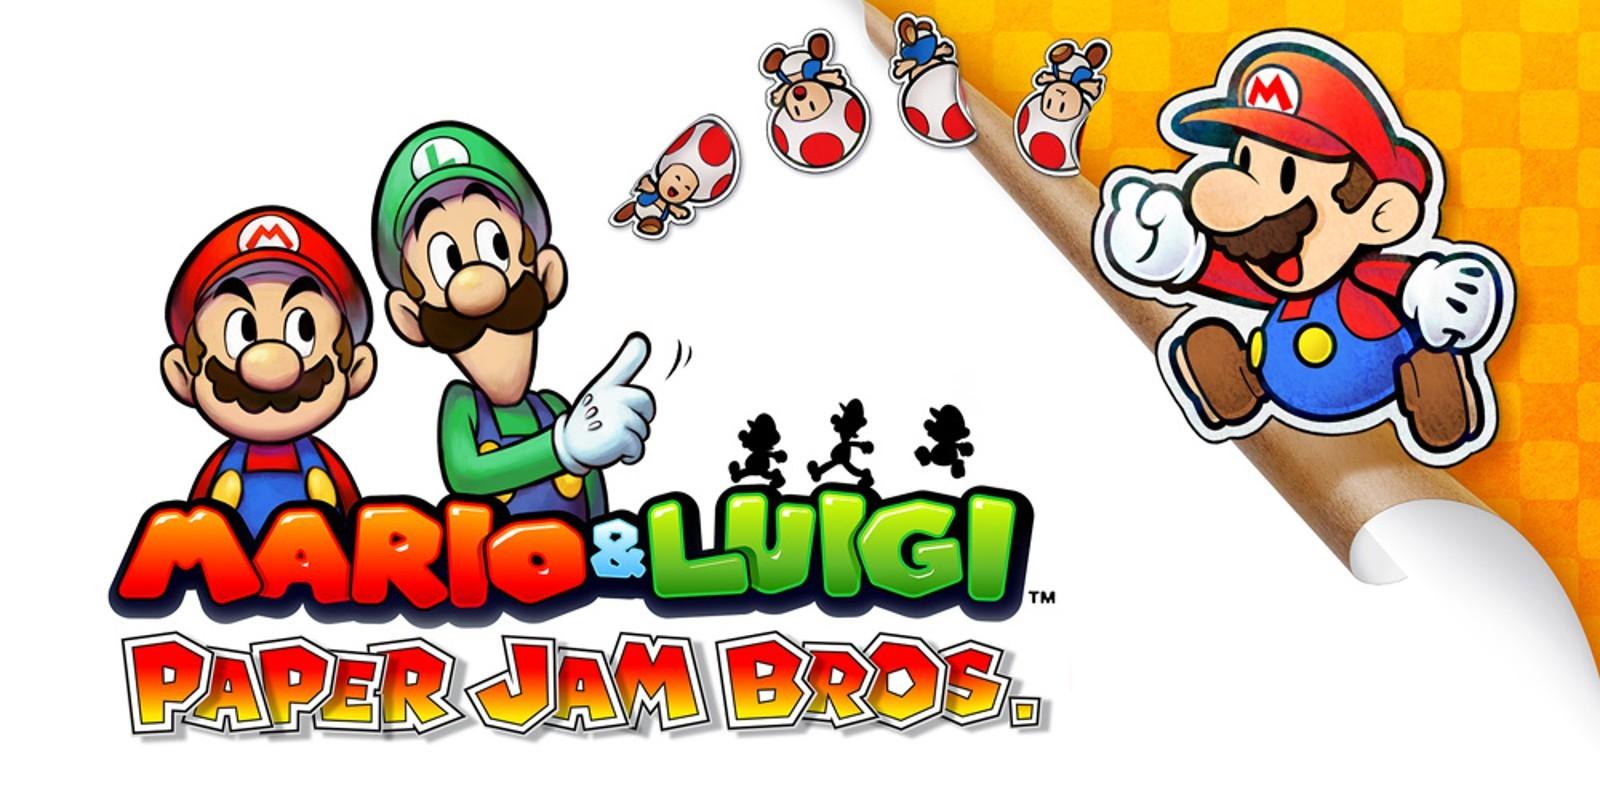 Mario Kart Papercraft Mario & Luigi Paper Jam Bros Nintendo 3ds Spiele